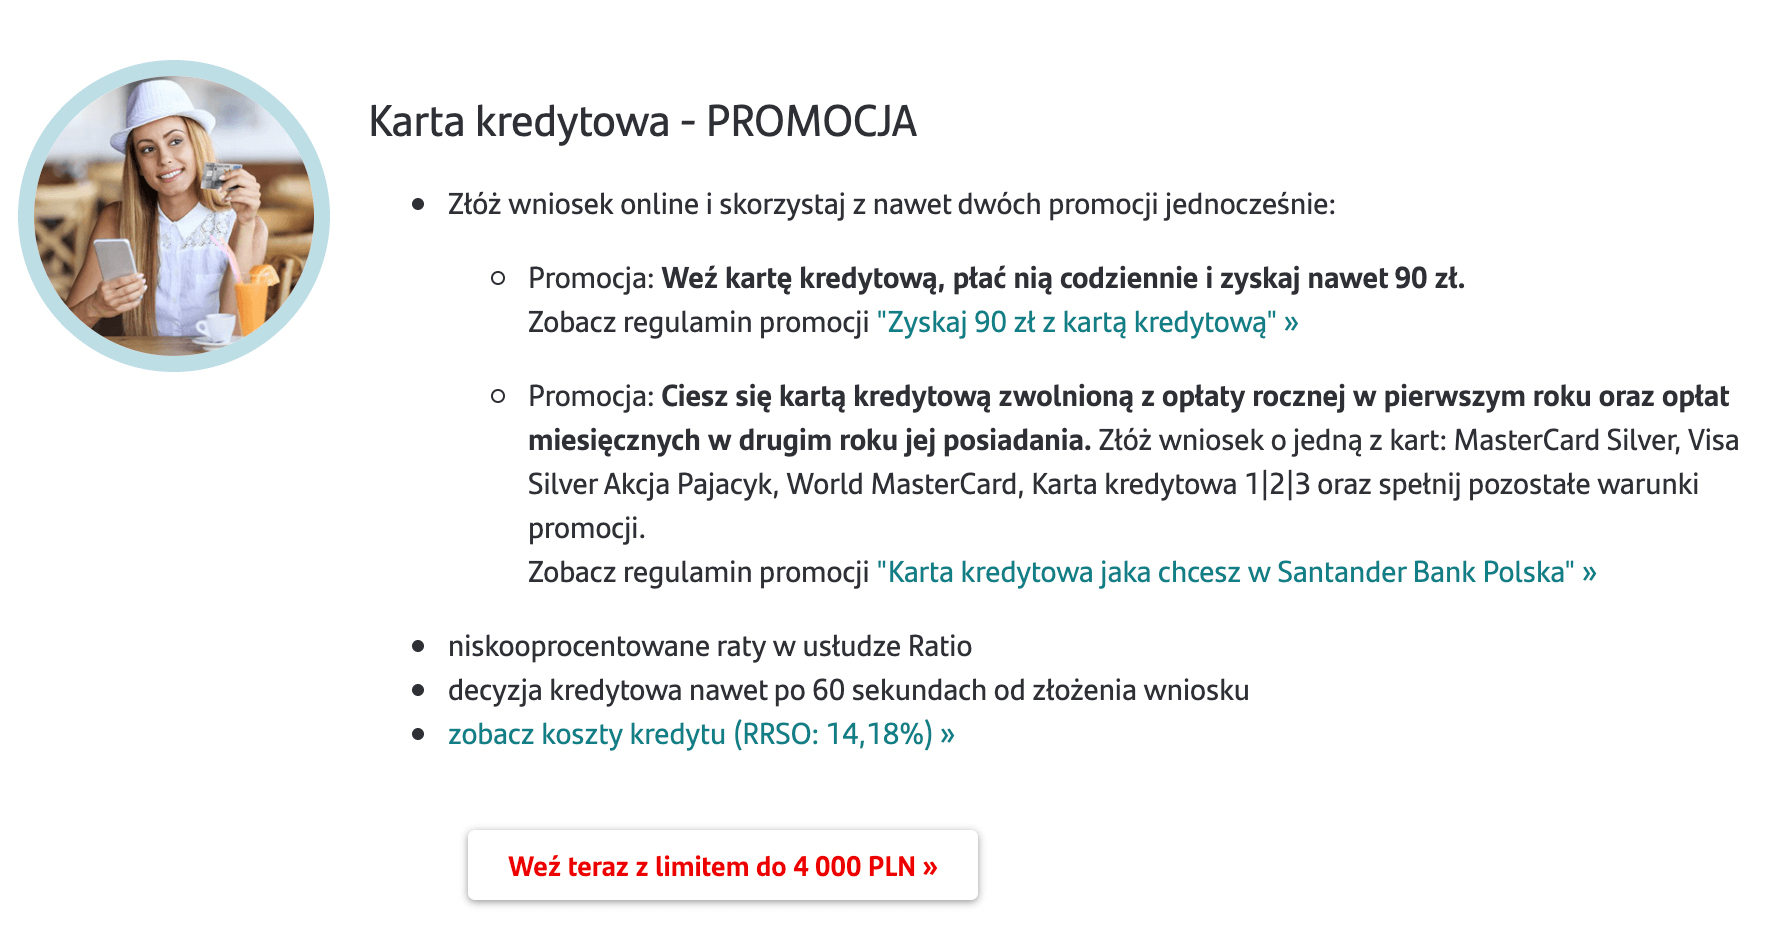 Santander Bank Polska - propozycja promocyjnej karty kredytowej